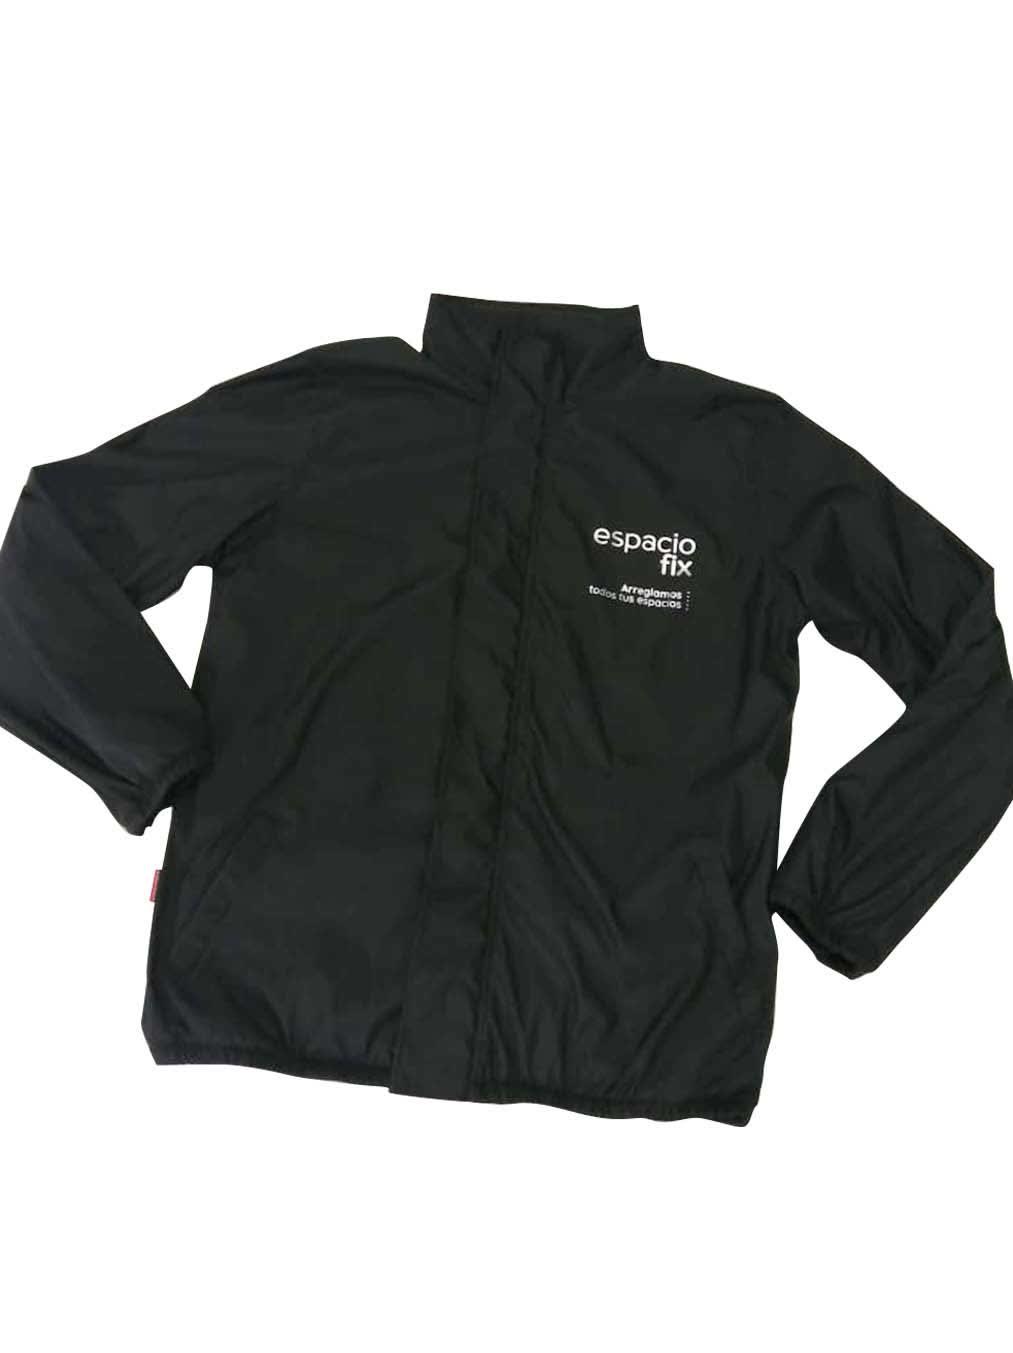 chaquetas para empresas